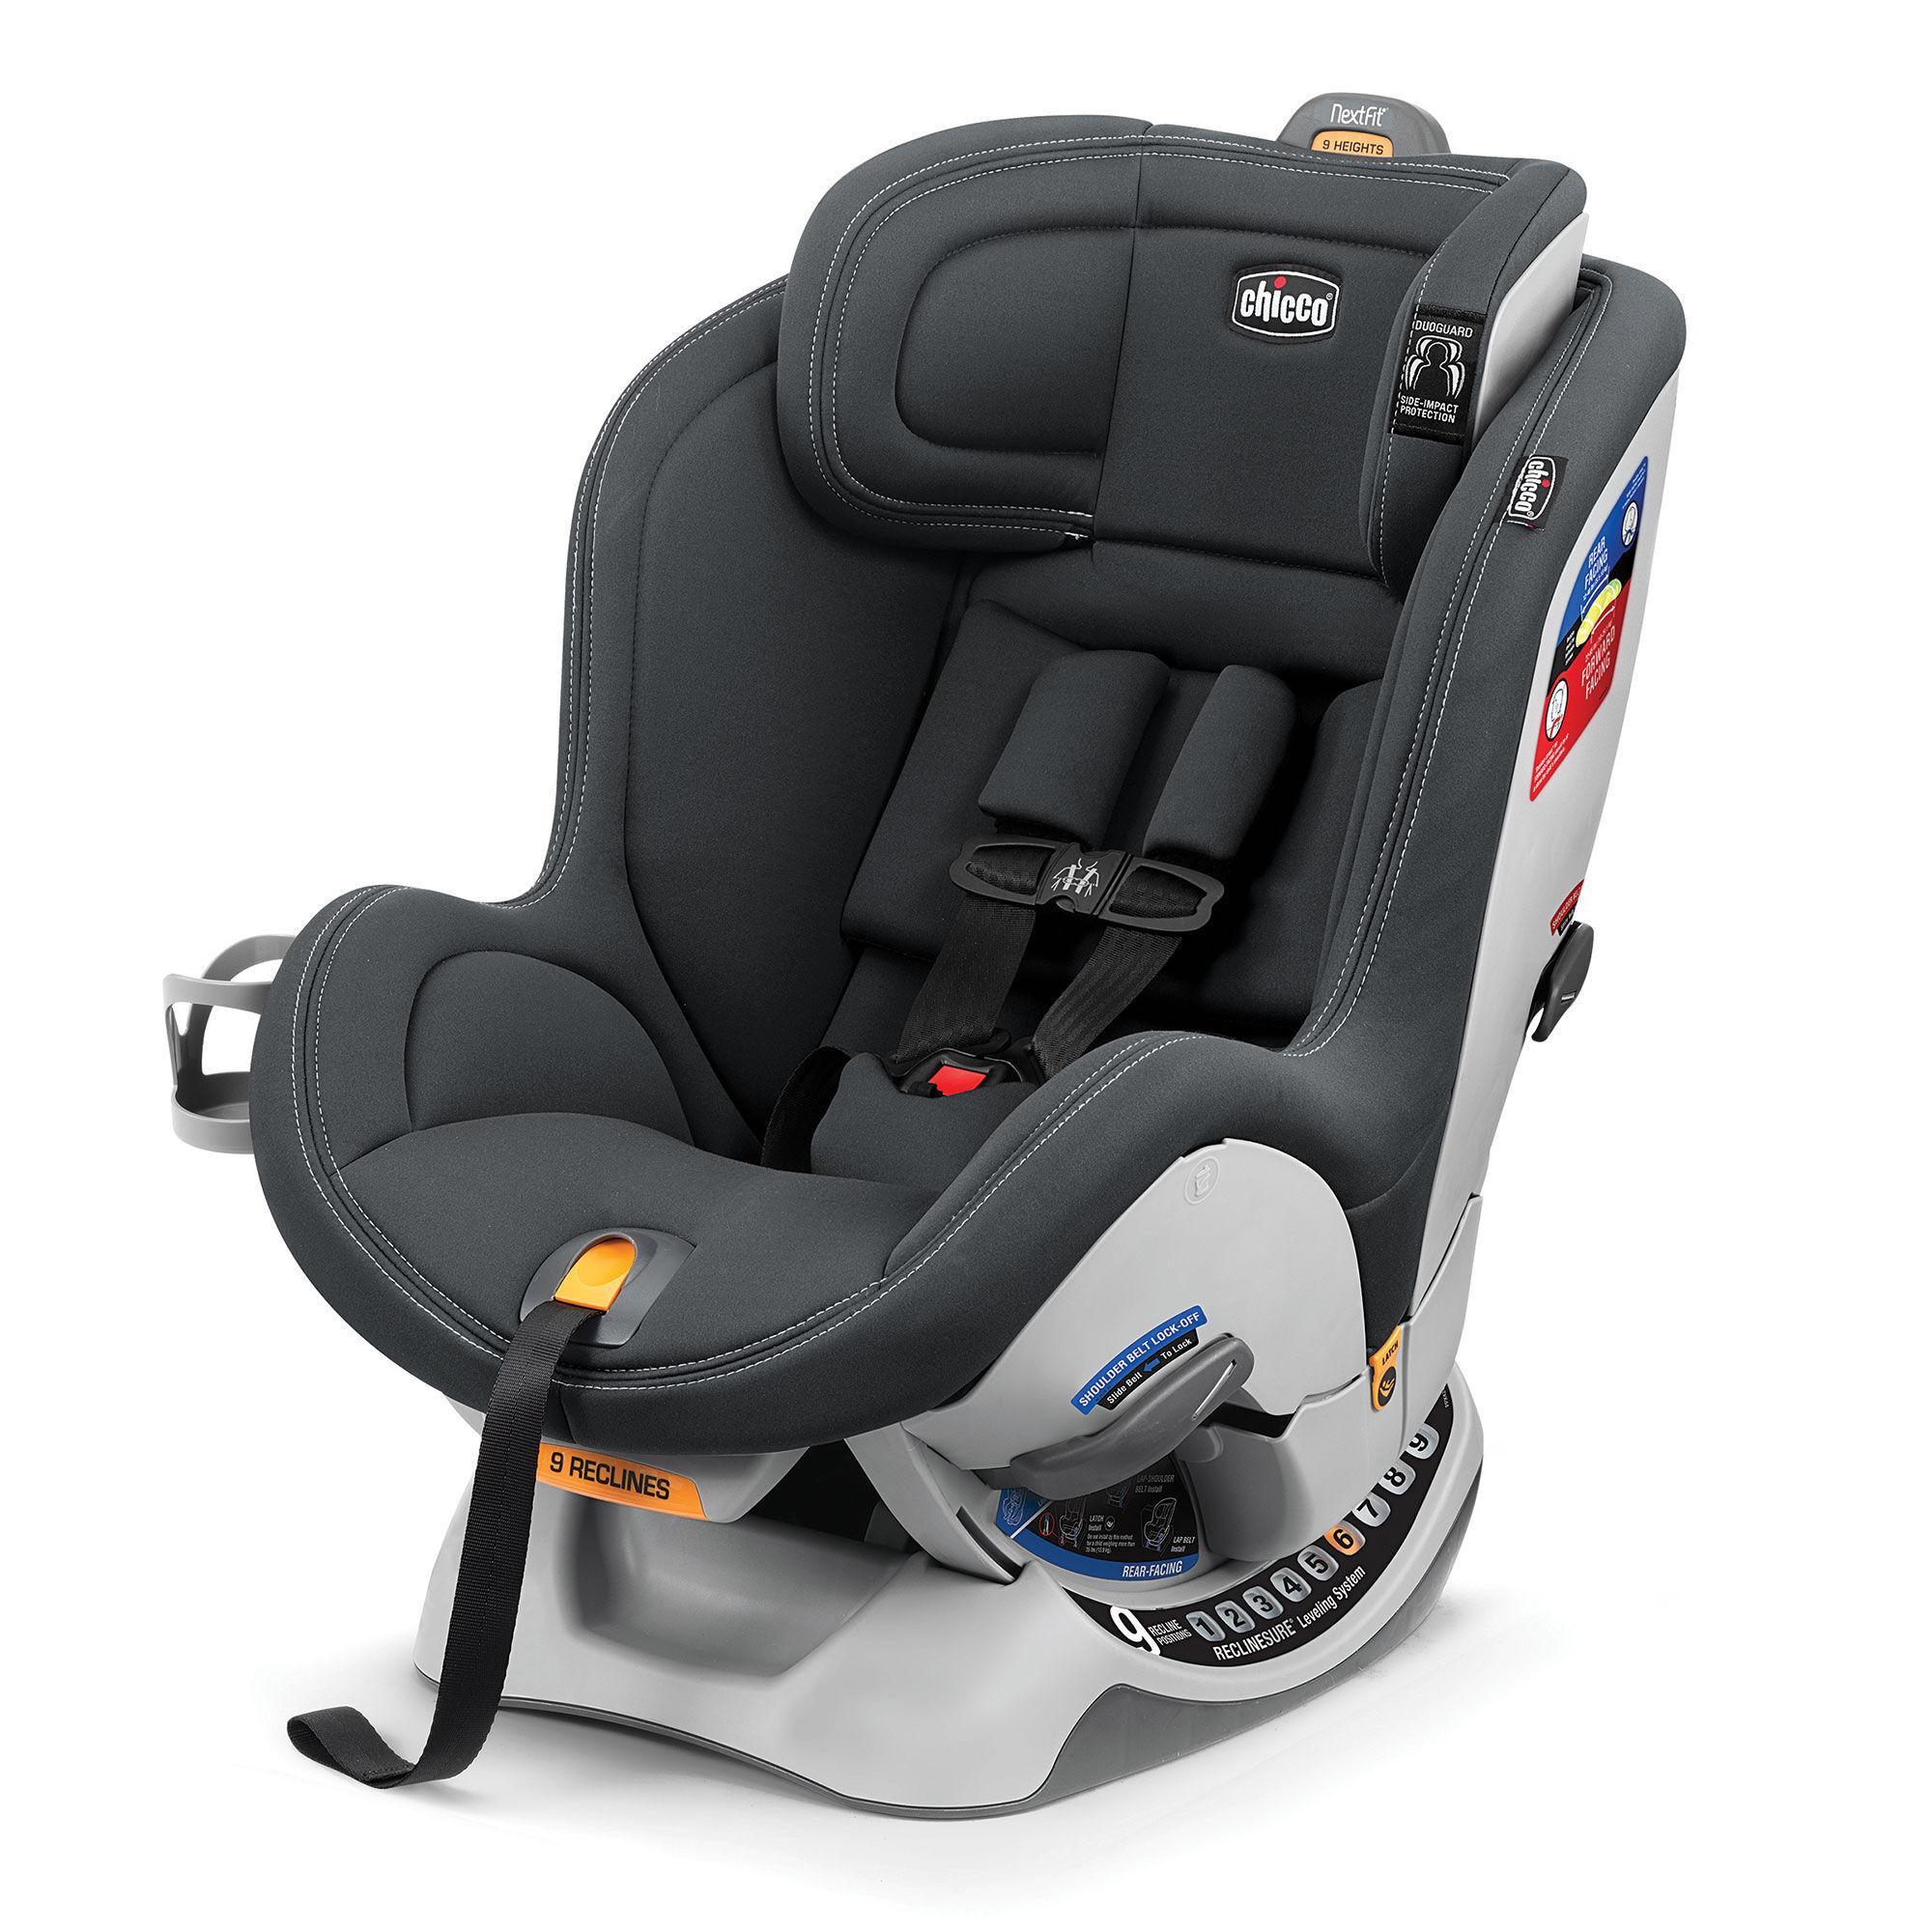 chicco-nextfit-sport-convertible-car-seat-graphite.jpg